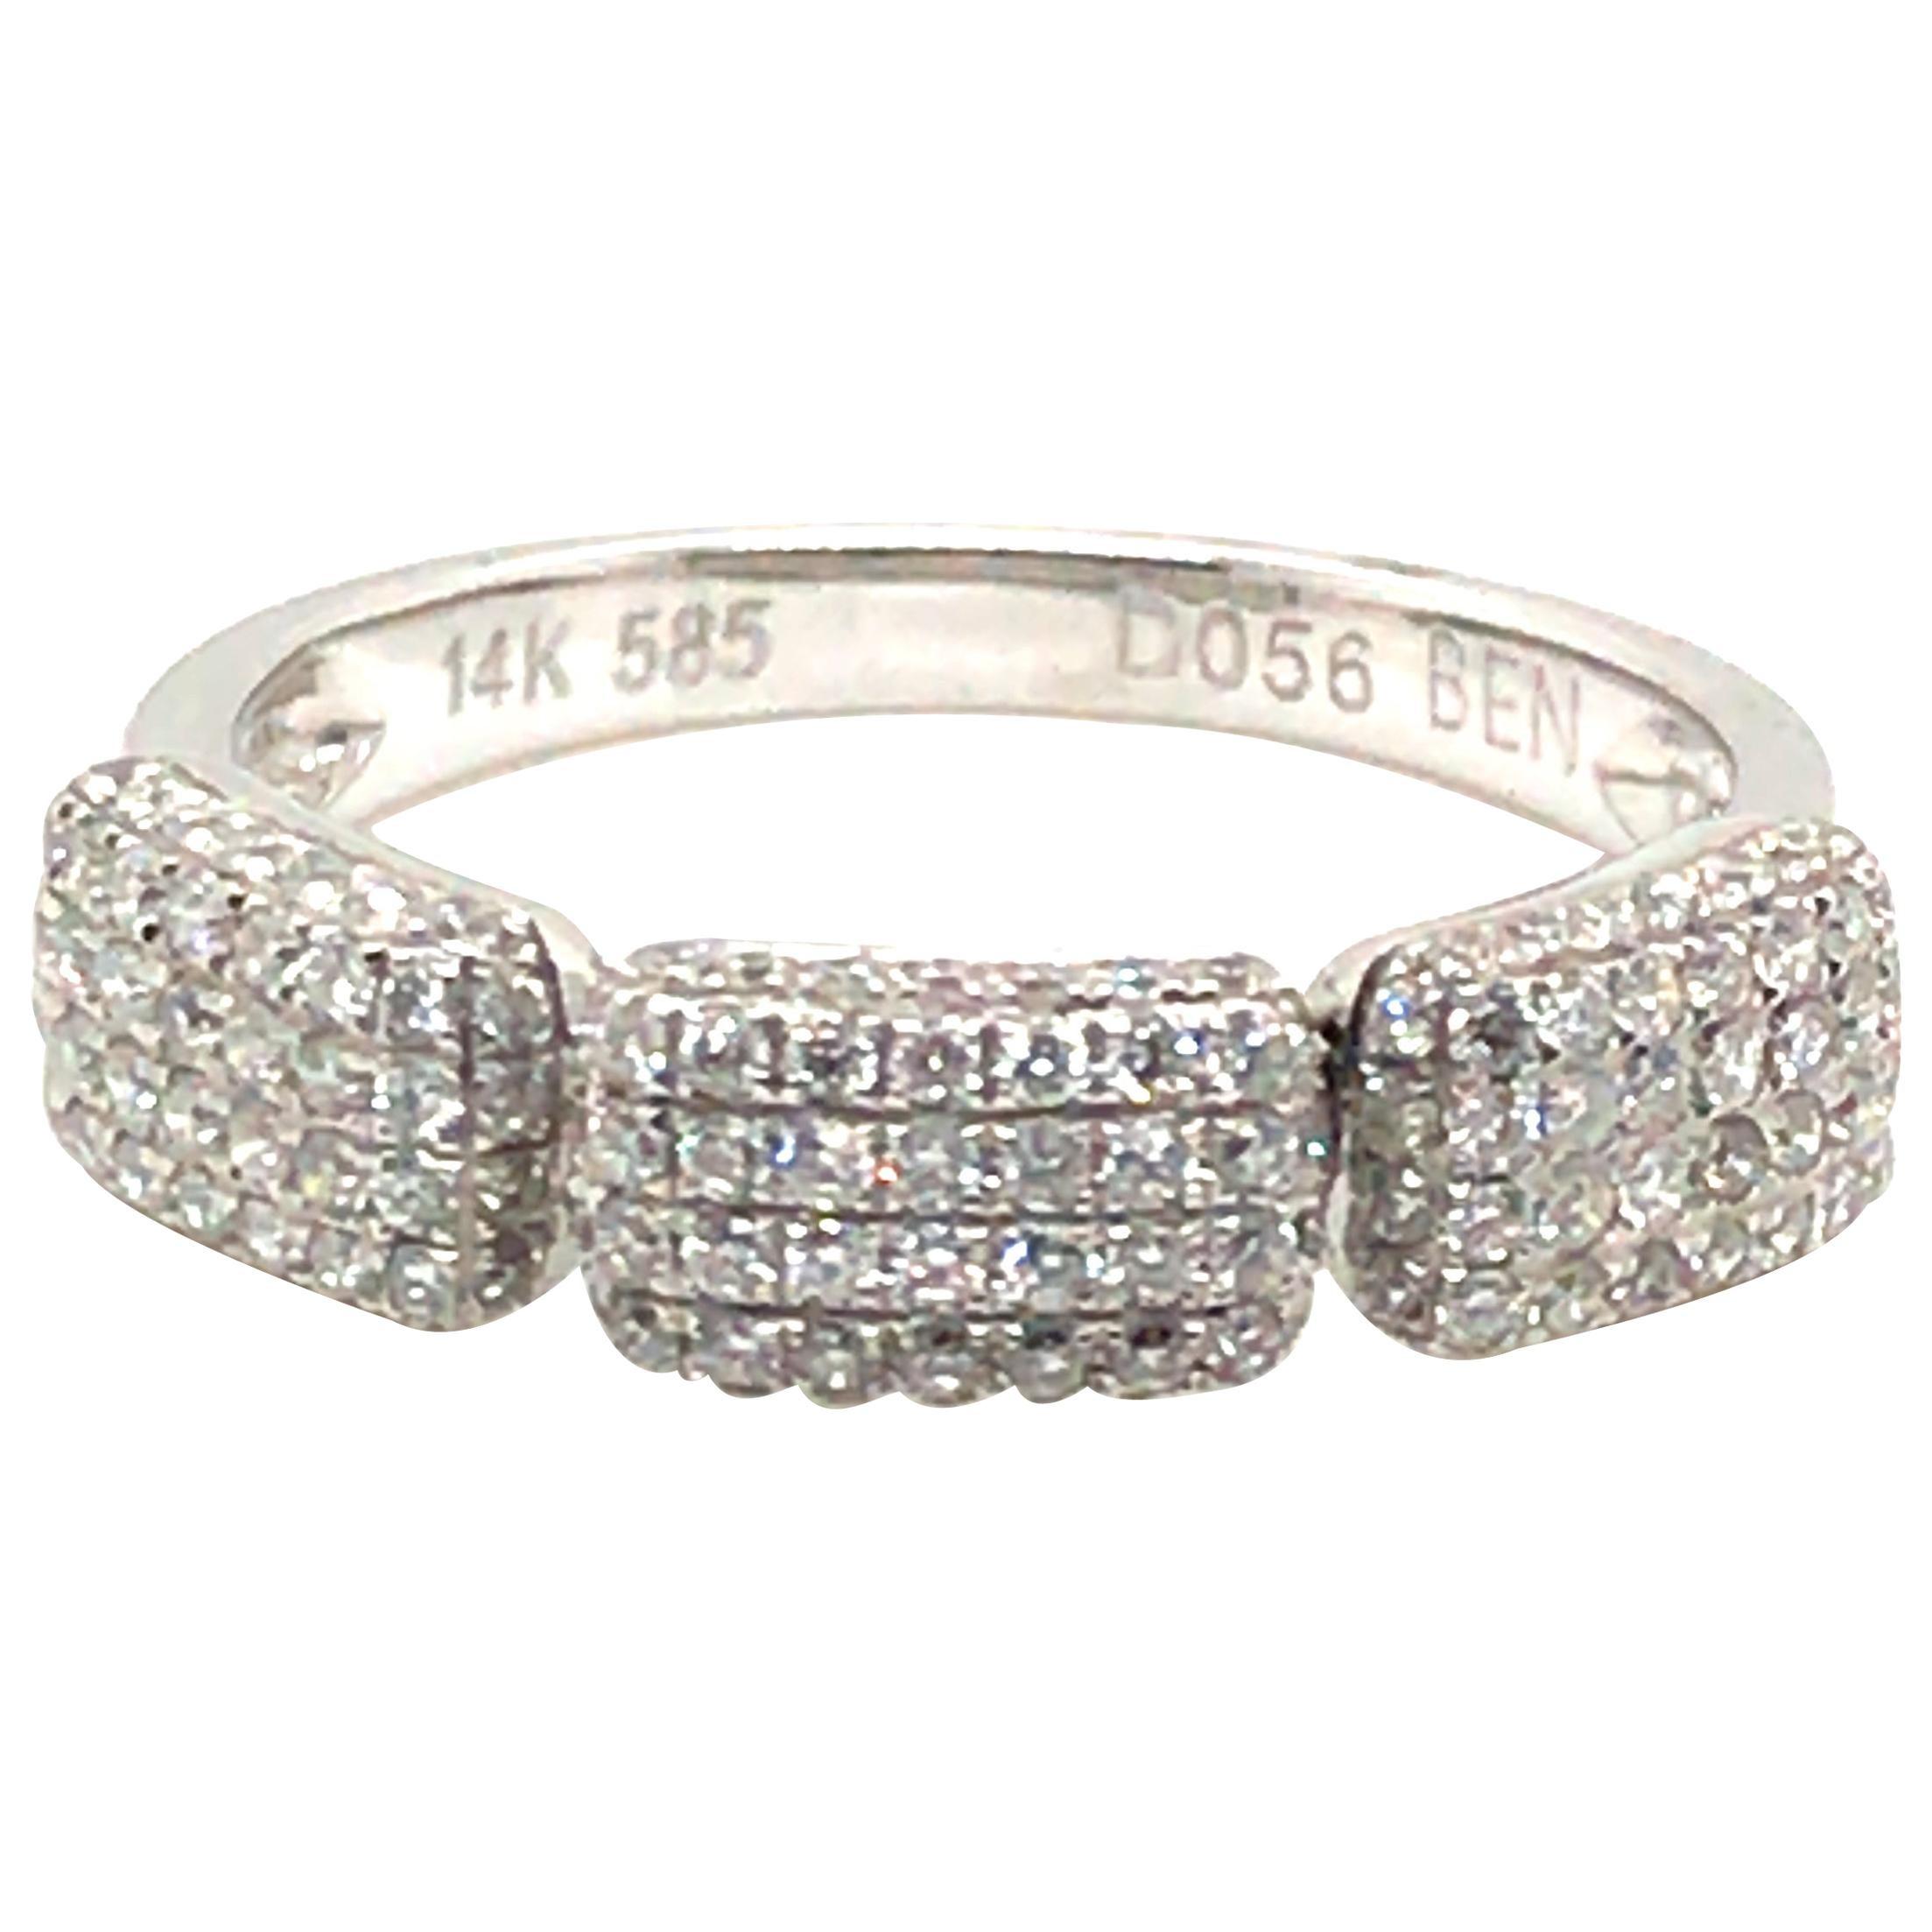 Square-Shaped Diamond Fashion Ring with 14 Karat Gold